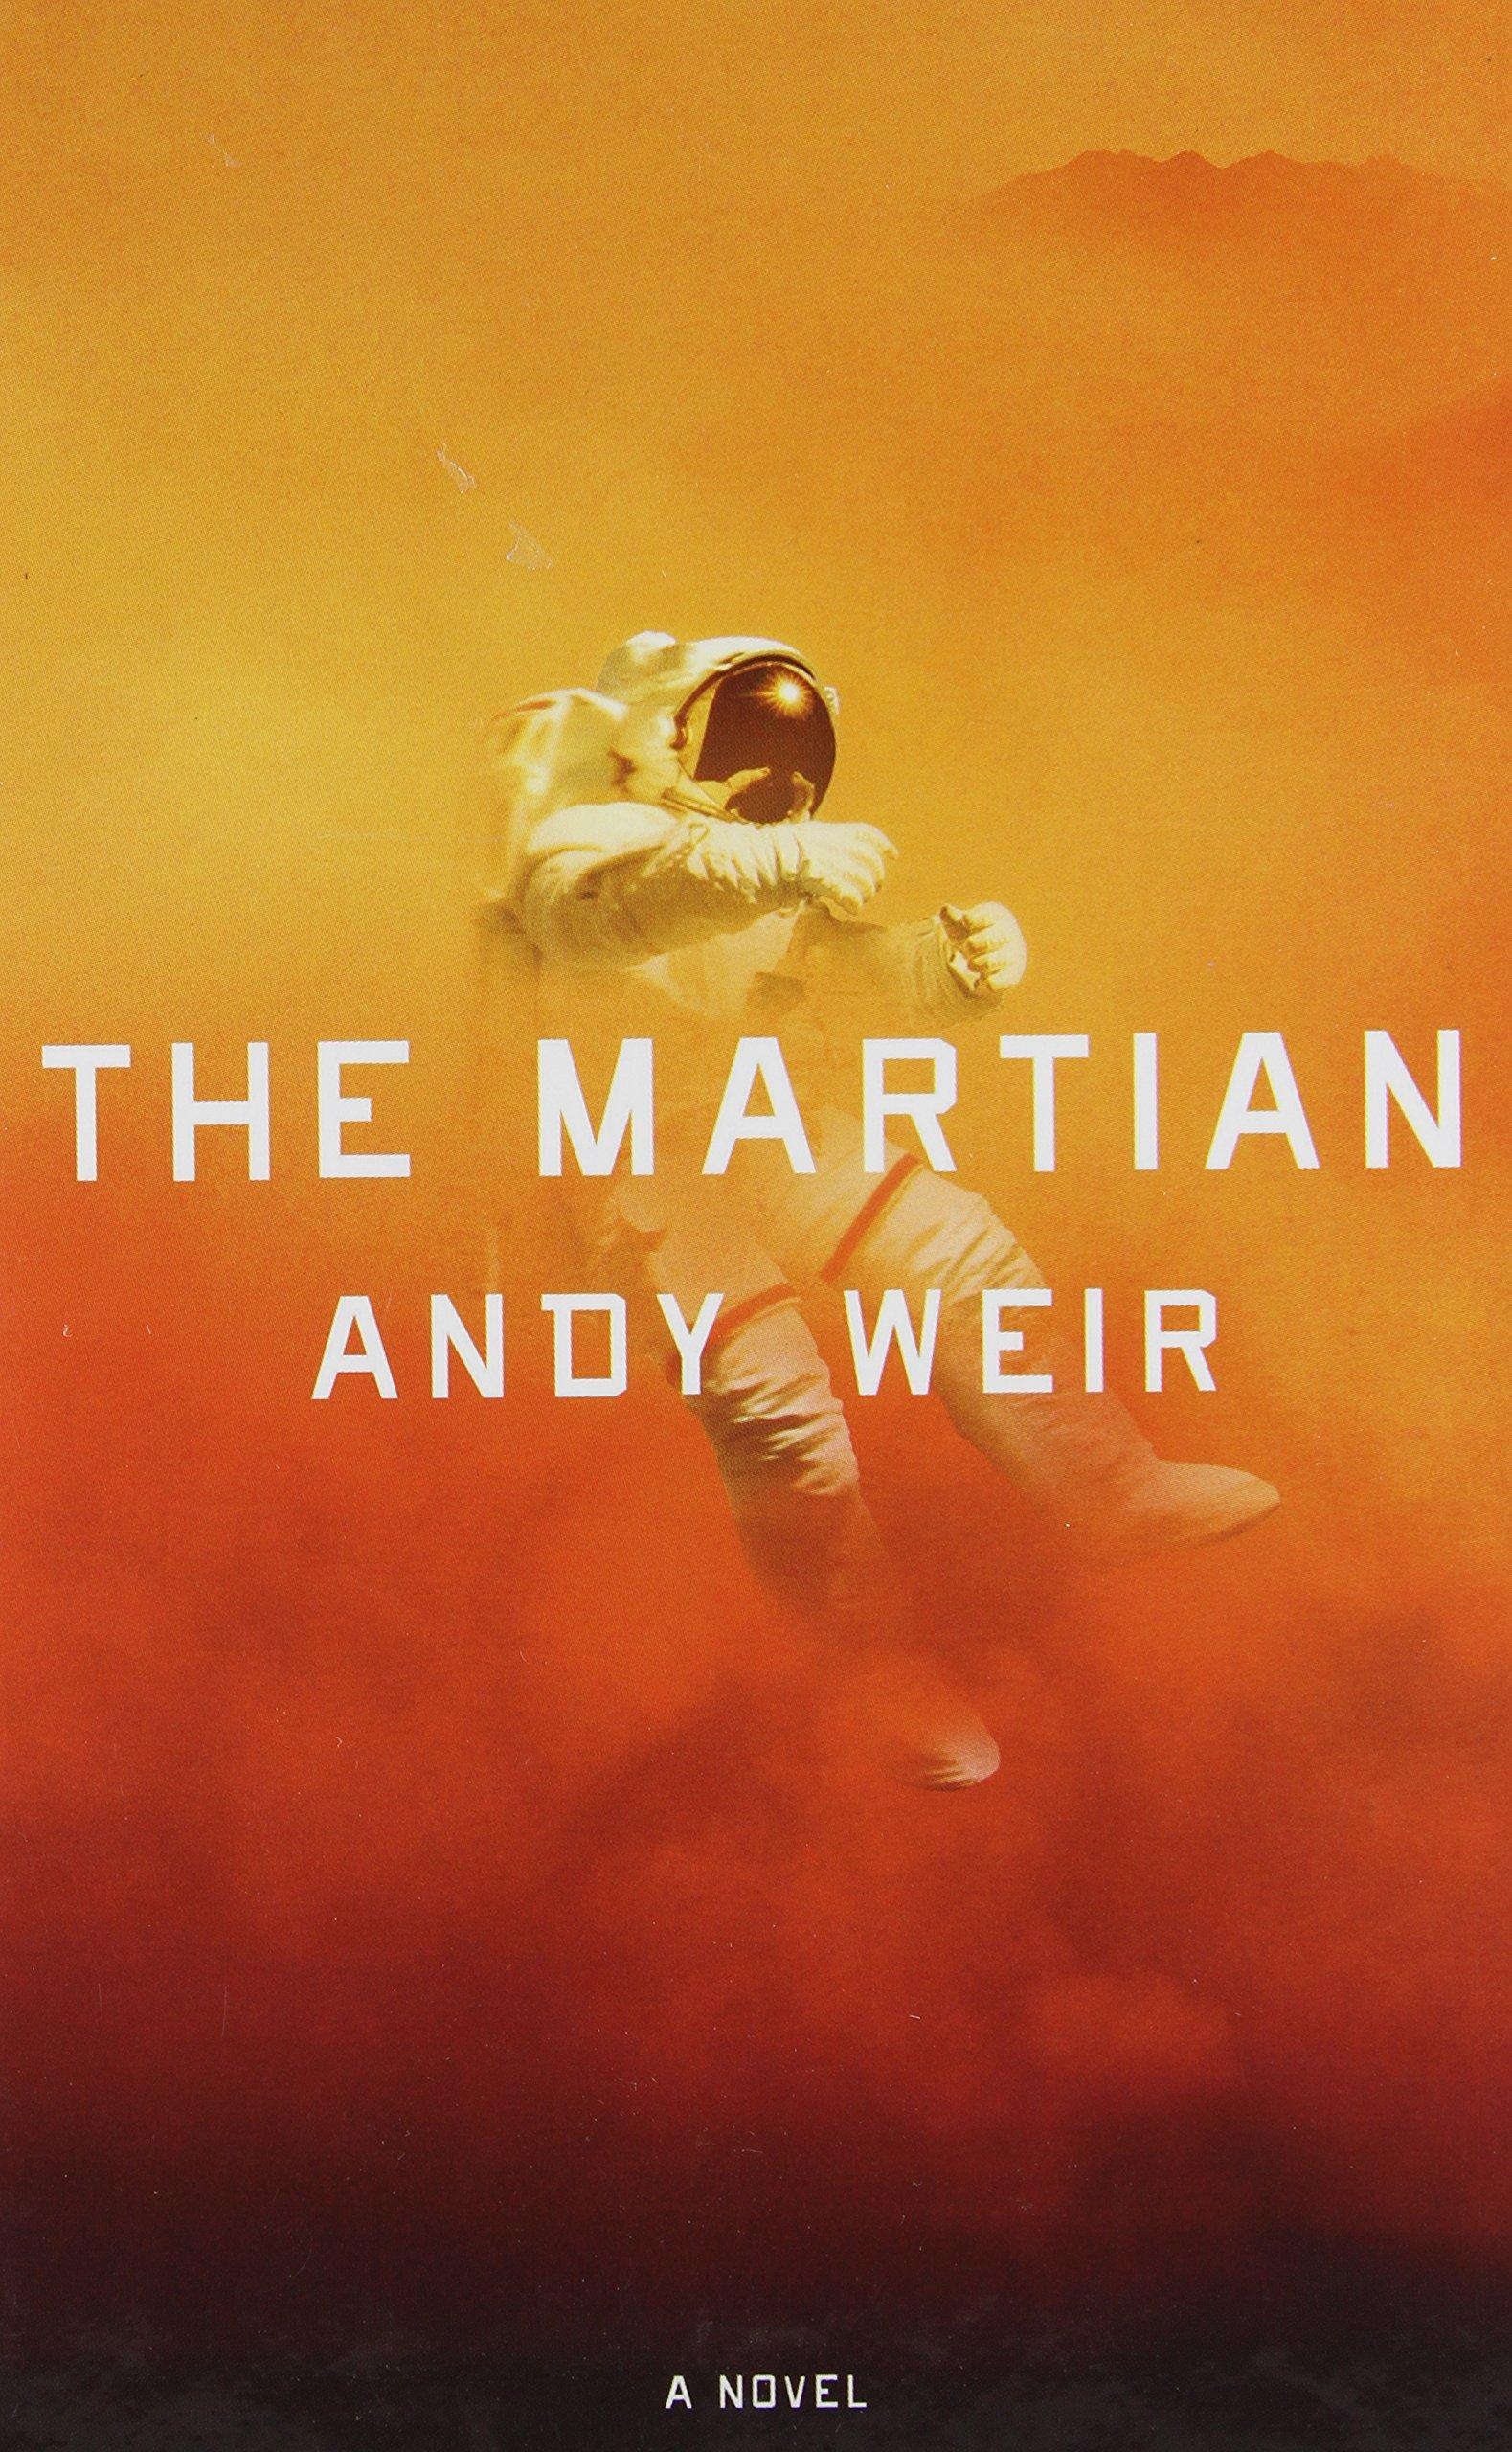 The Martian (Thorndike Press Large Print Thriller): Amazon ...